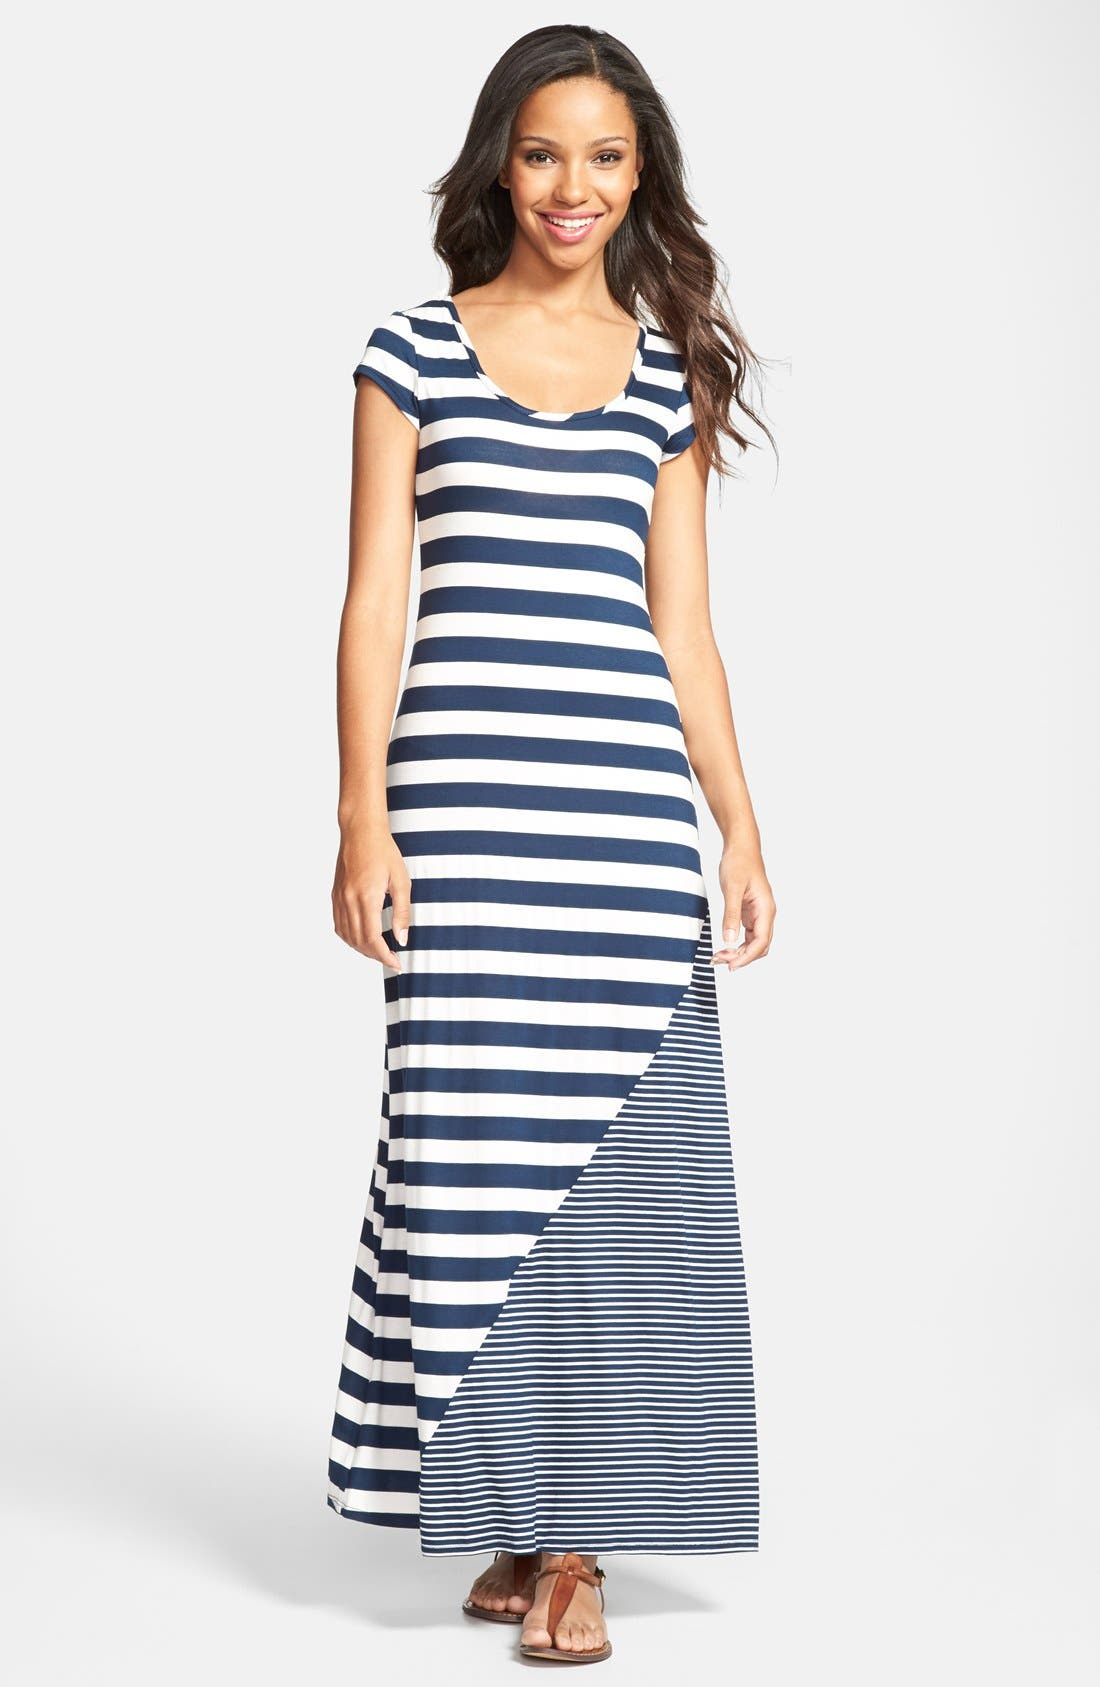 Alternate Image 1 Selected - Everleigh Multi Stripe Short Sleeve Maxi Dress (Regular & Petite)